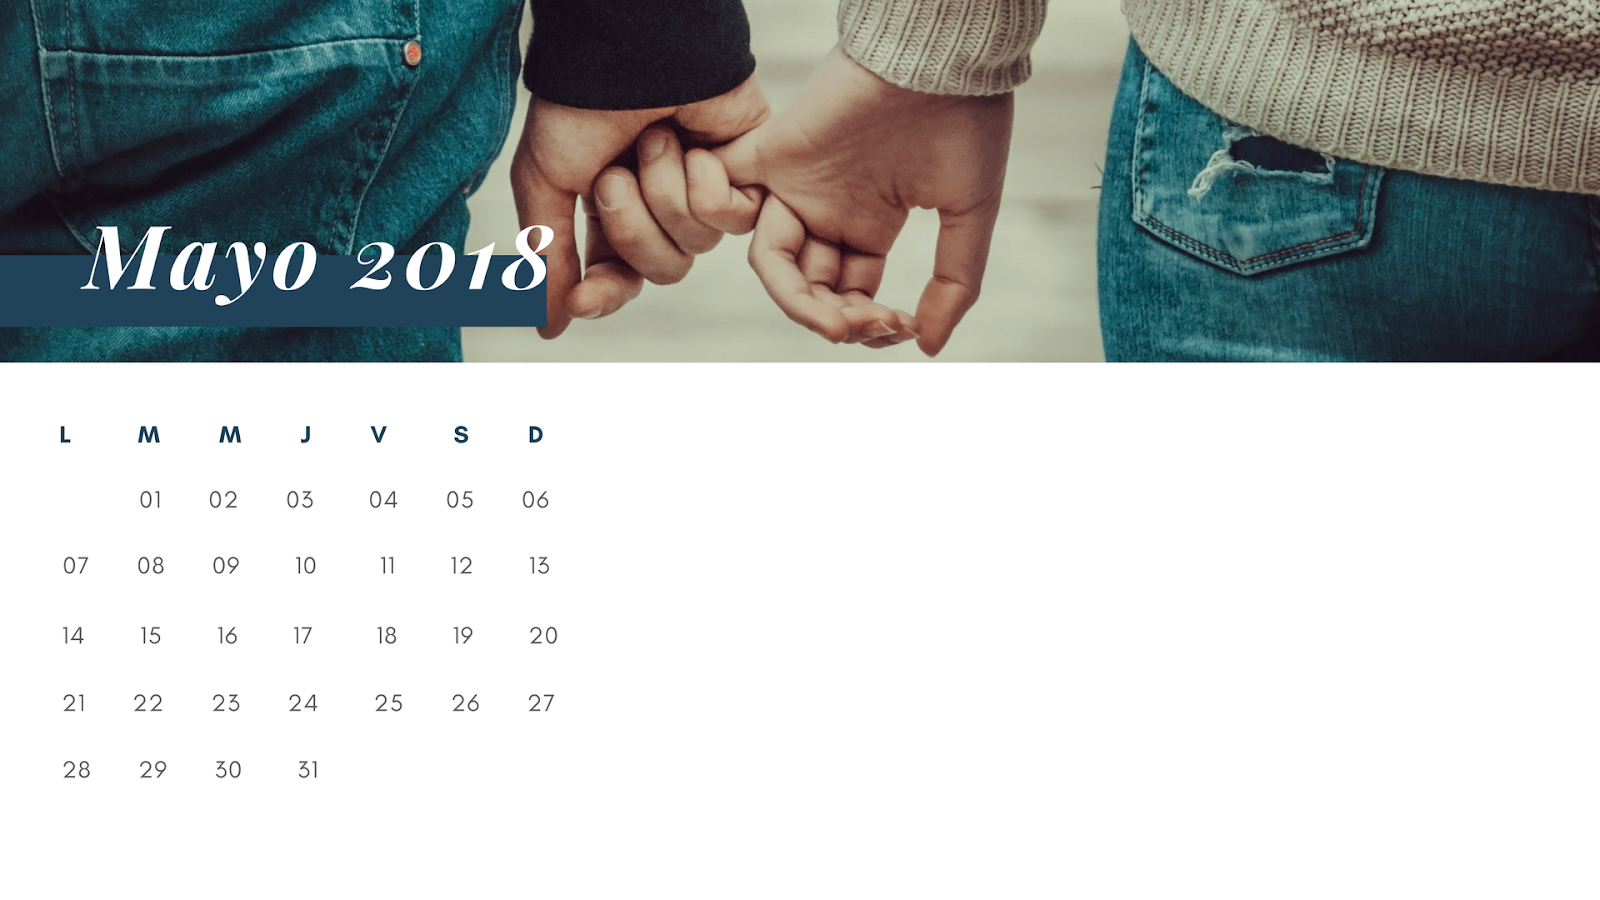 Fondos Para Móvil Bonitos Calendario Wallpaper Mayo 2018